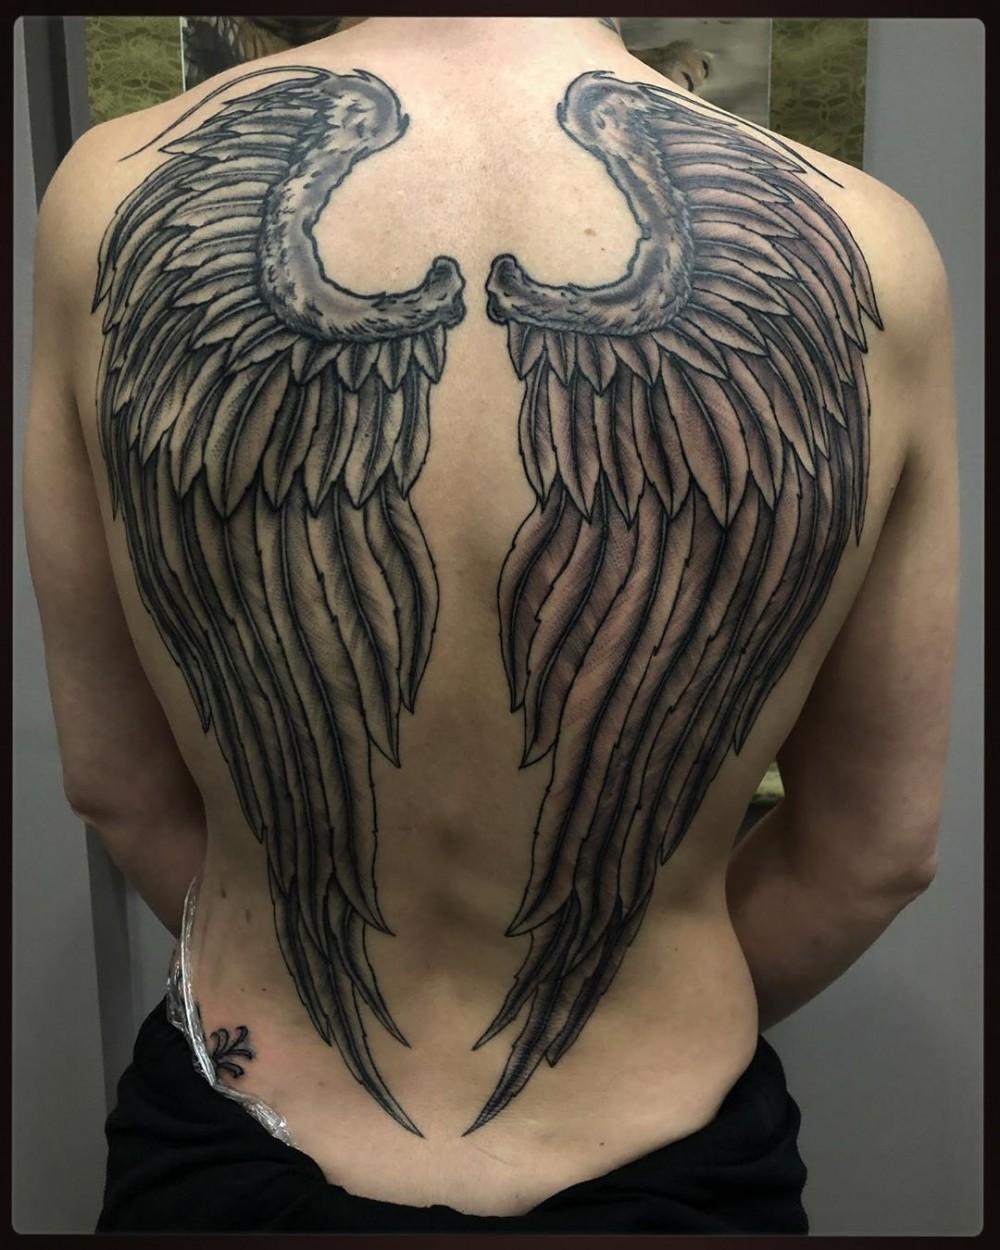 fresh-heal-angel-wing-tattoo-okteash